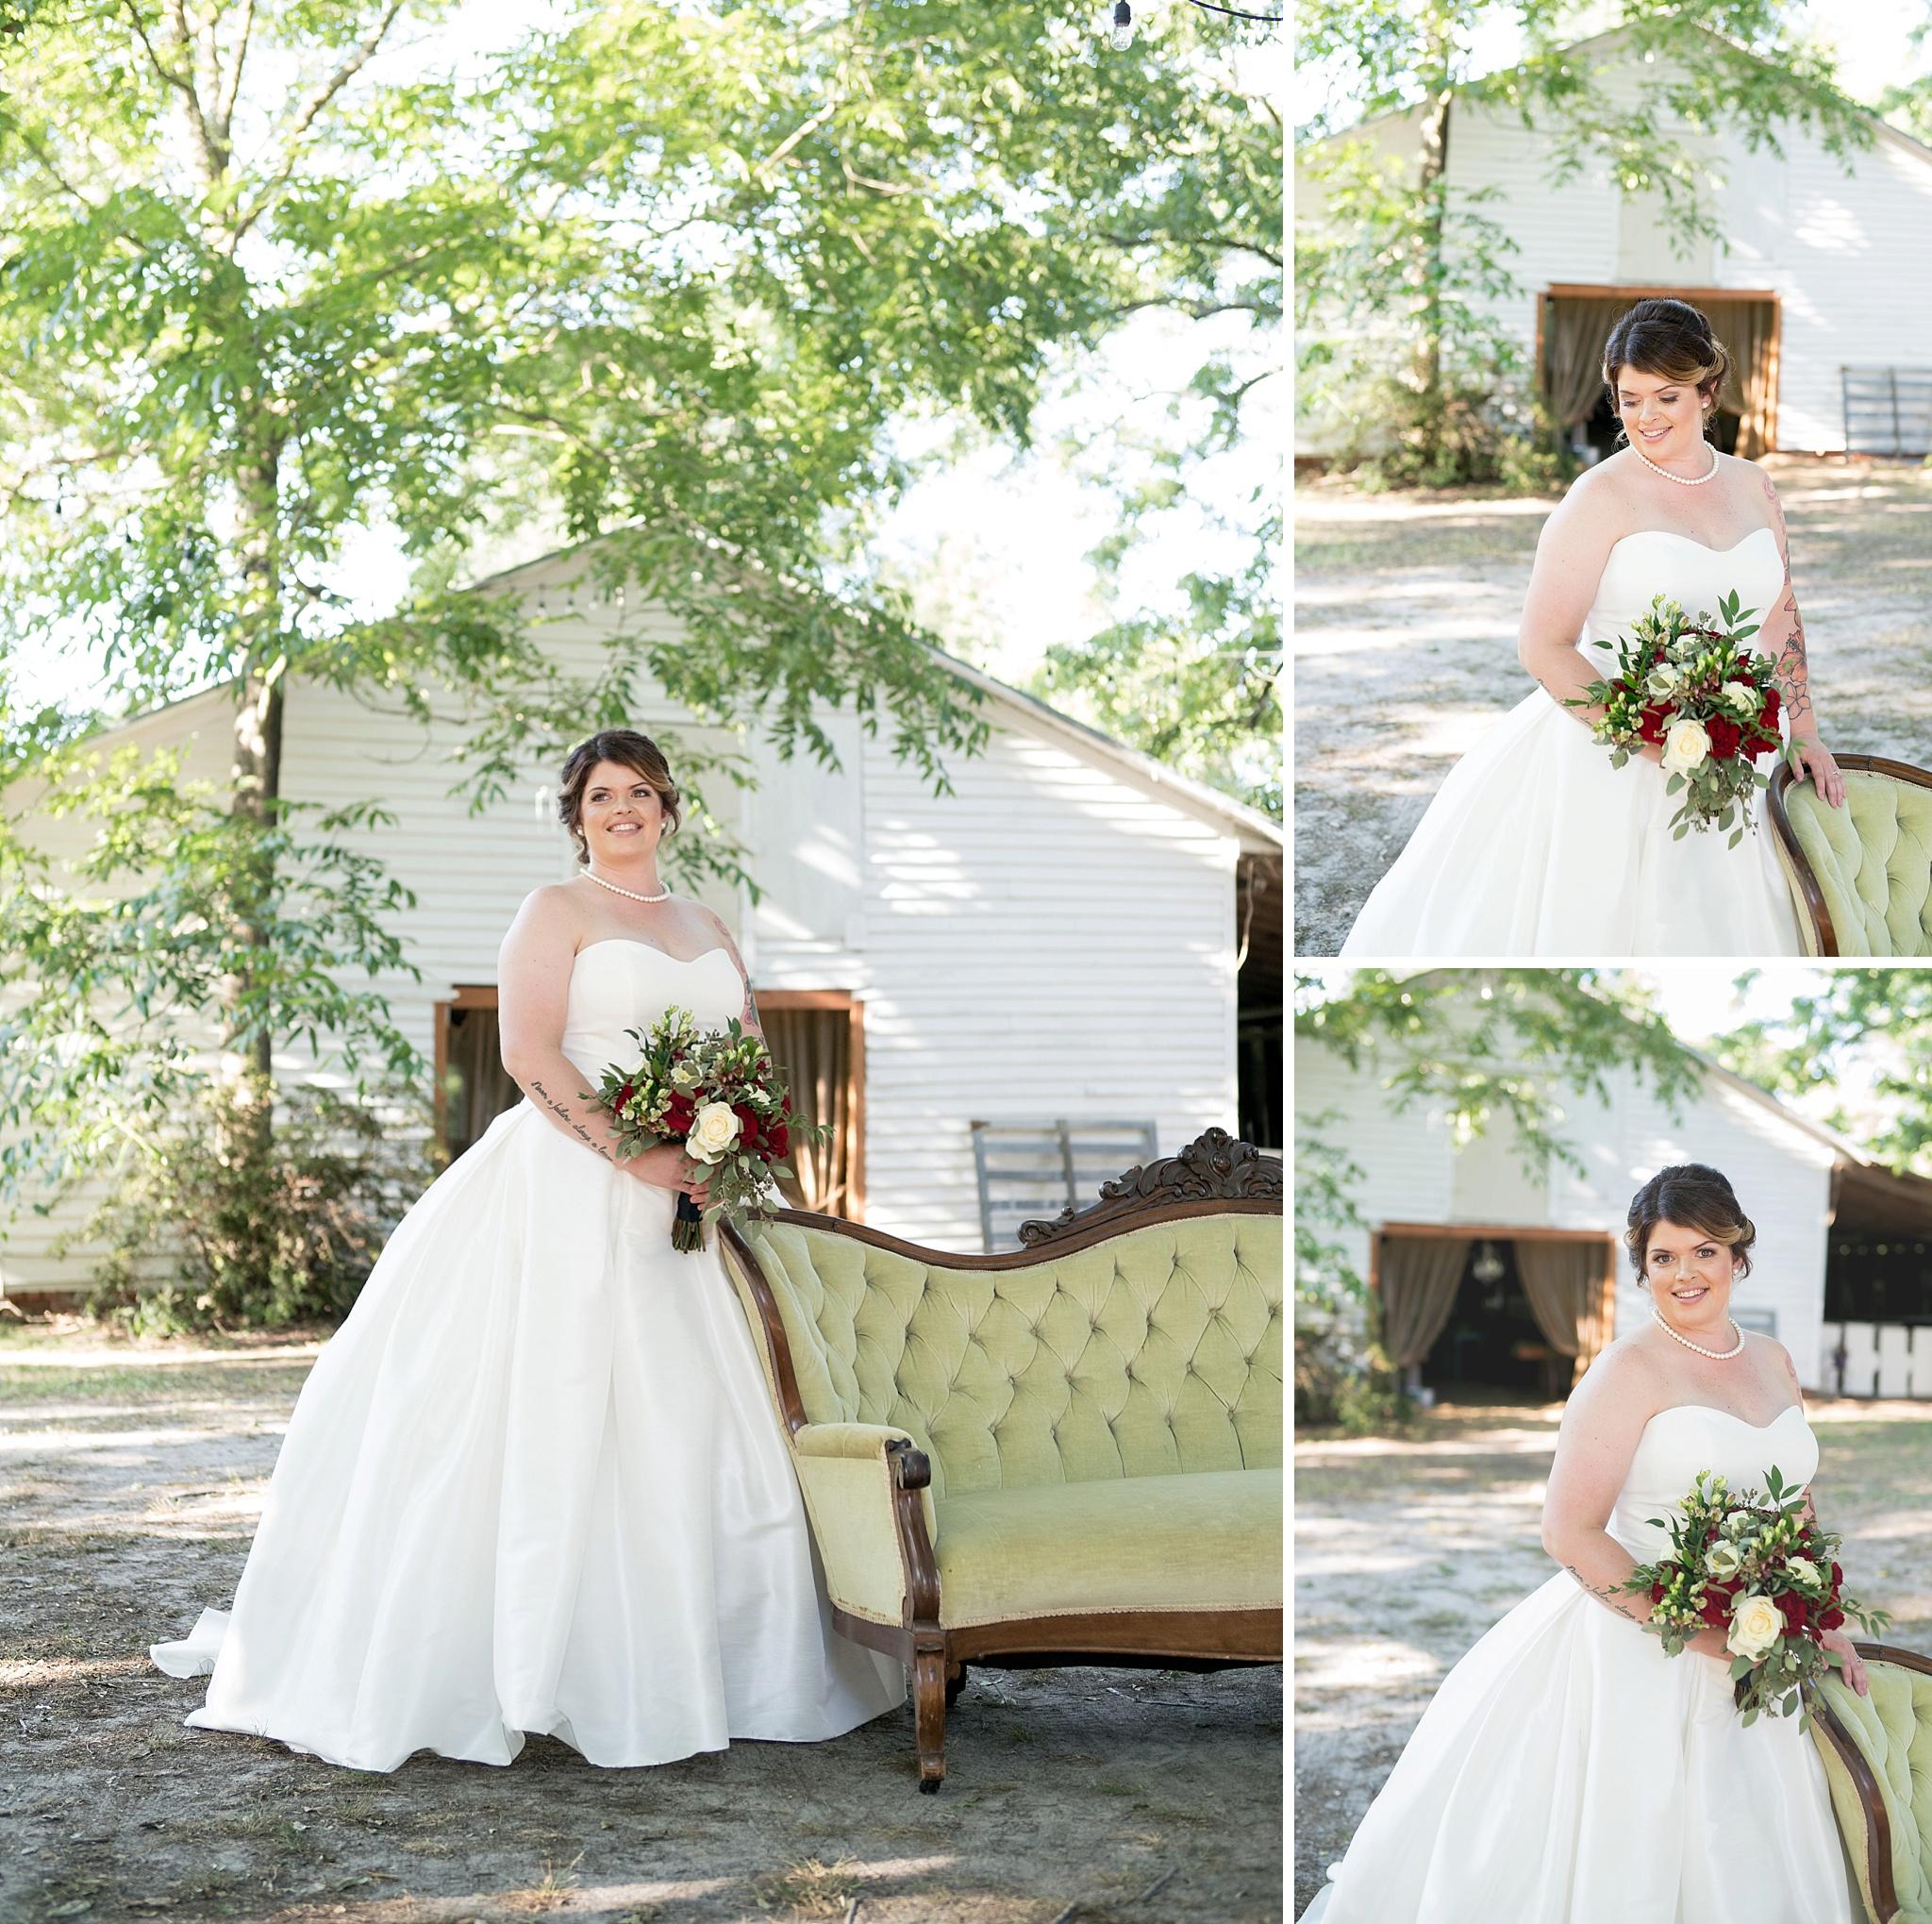 Longstraw-Farms-Wedding-Photographer-045.jpg